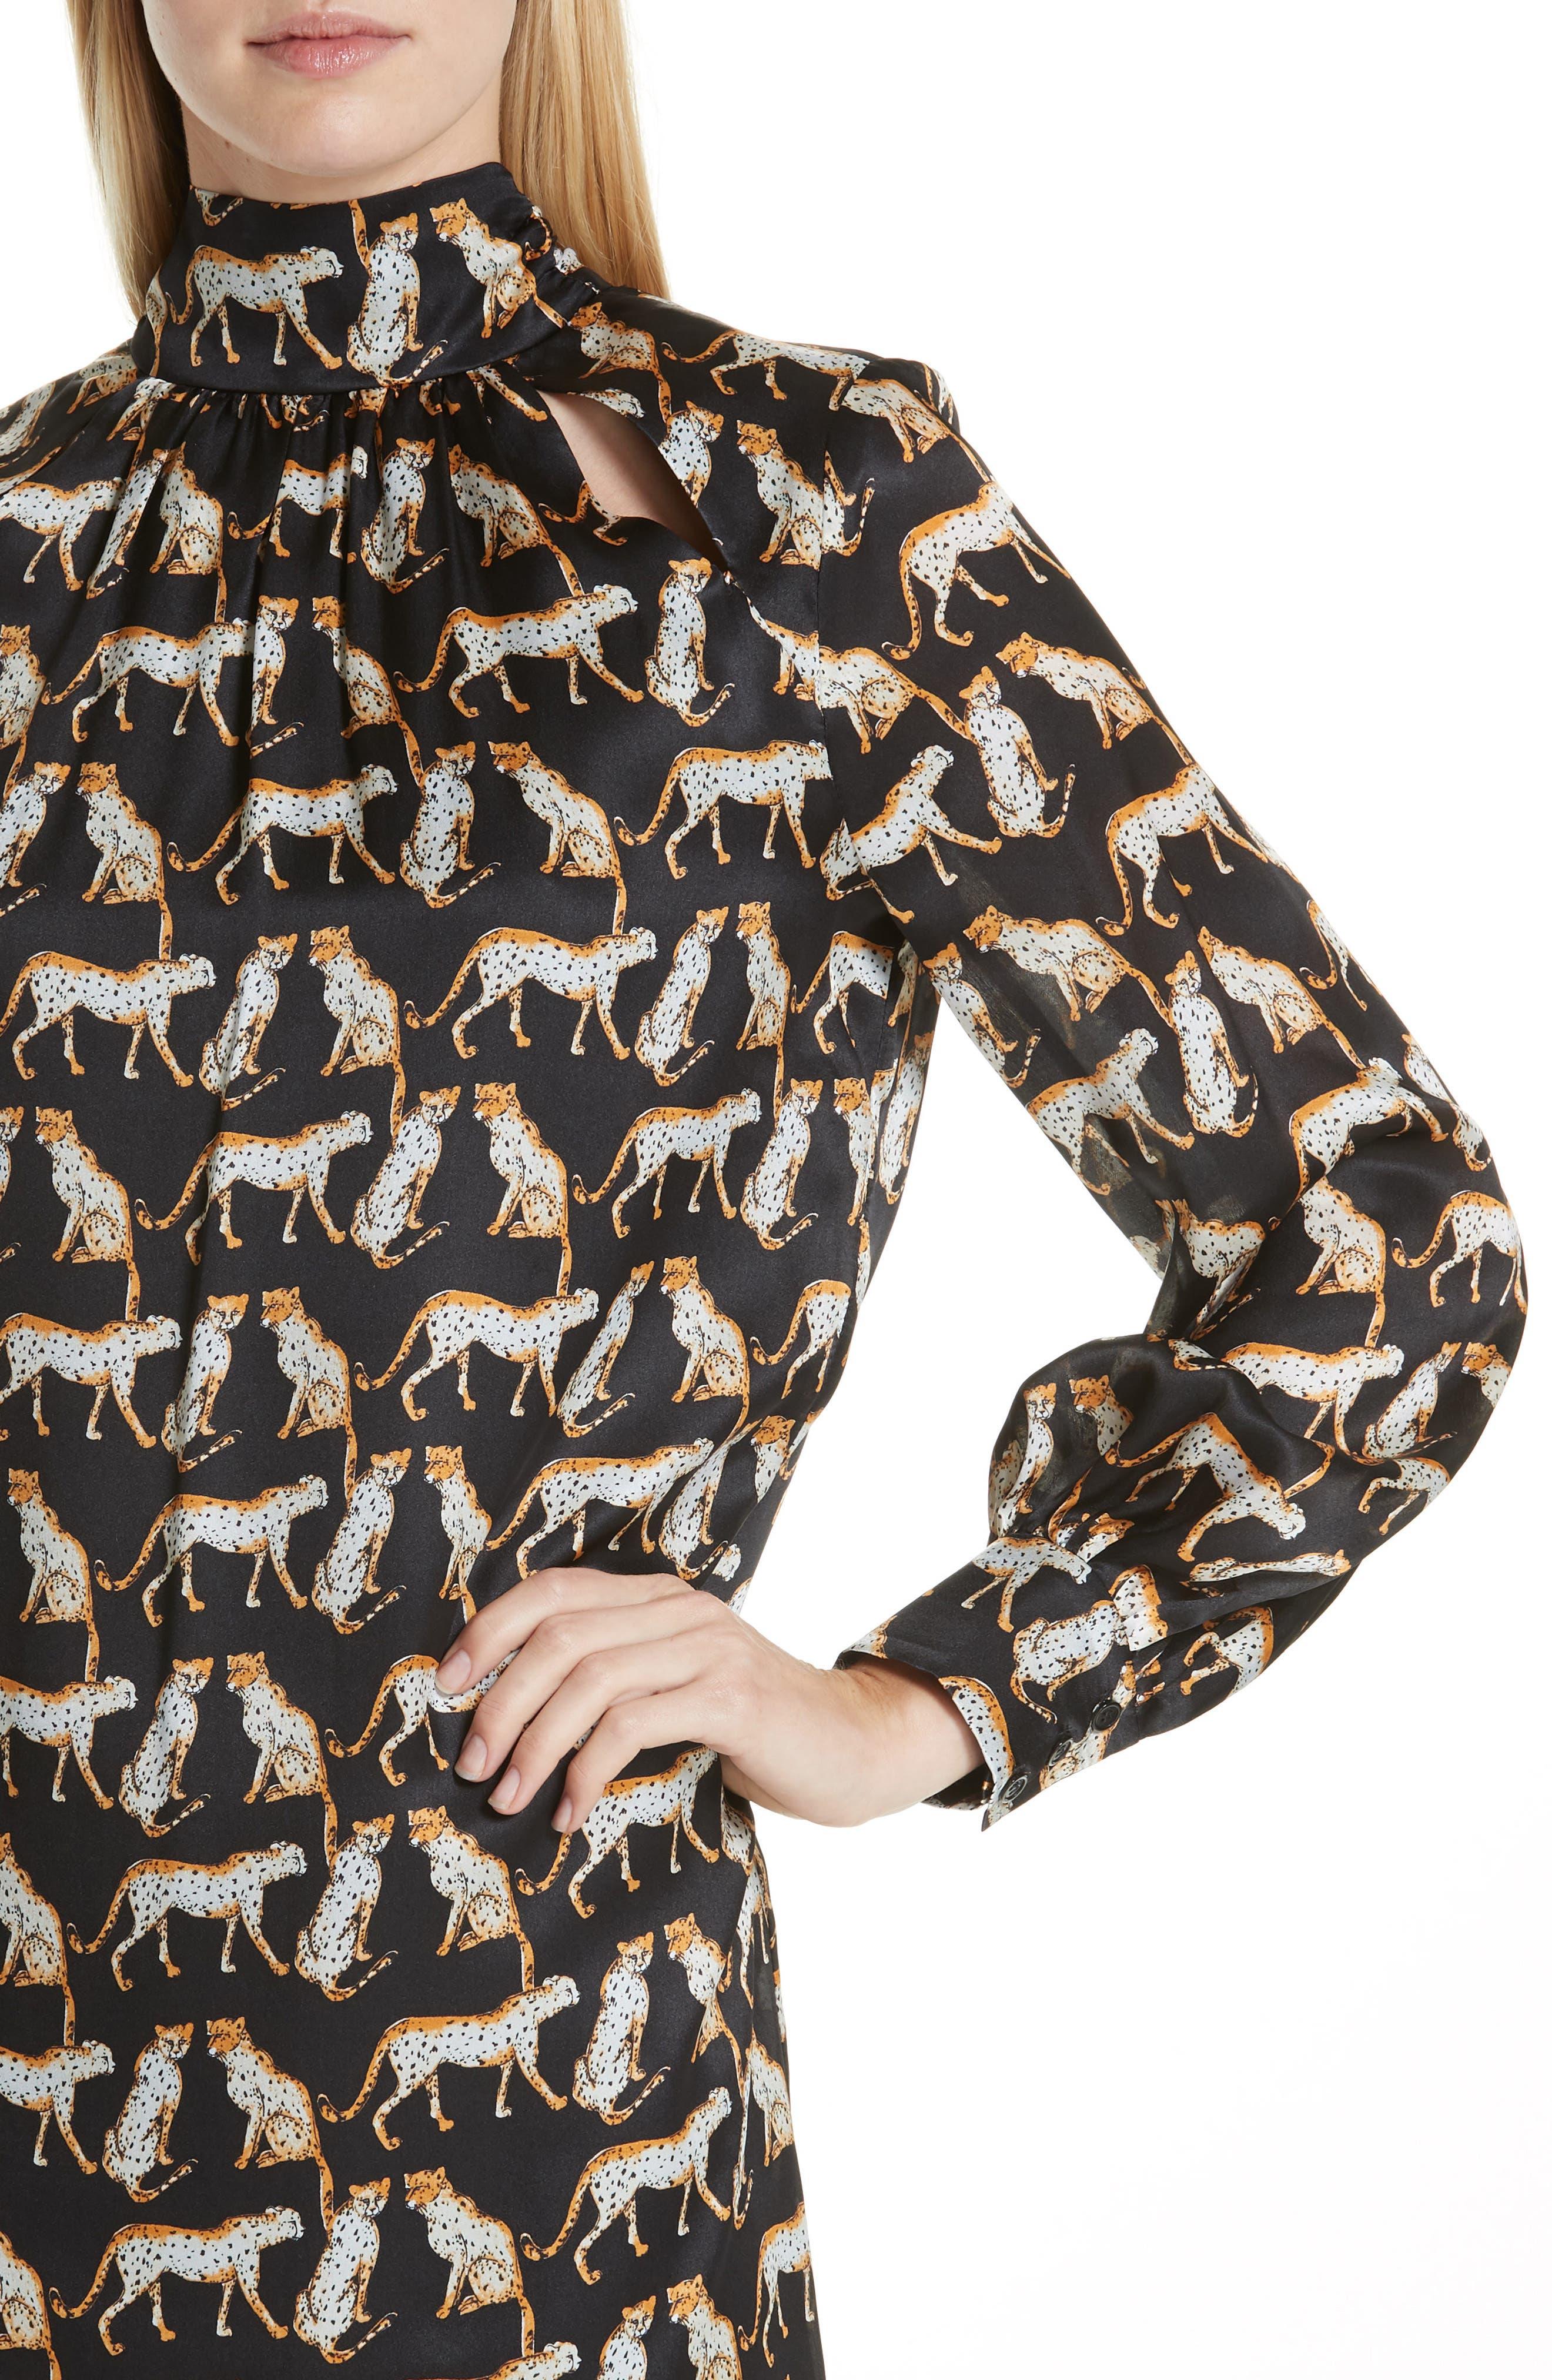 MILLY,                             Cheetah Print High Neck Silk Dress,                             Alternate thumbnail 4, color,                             001